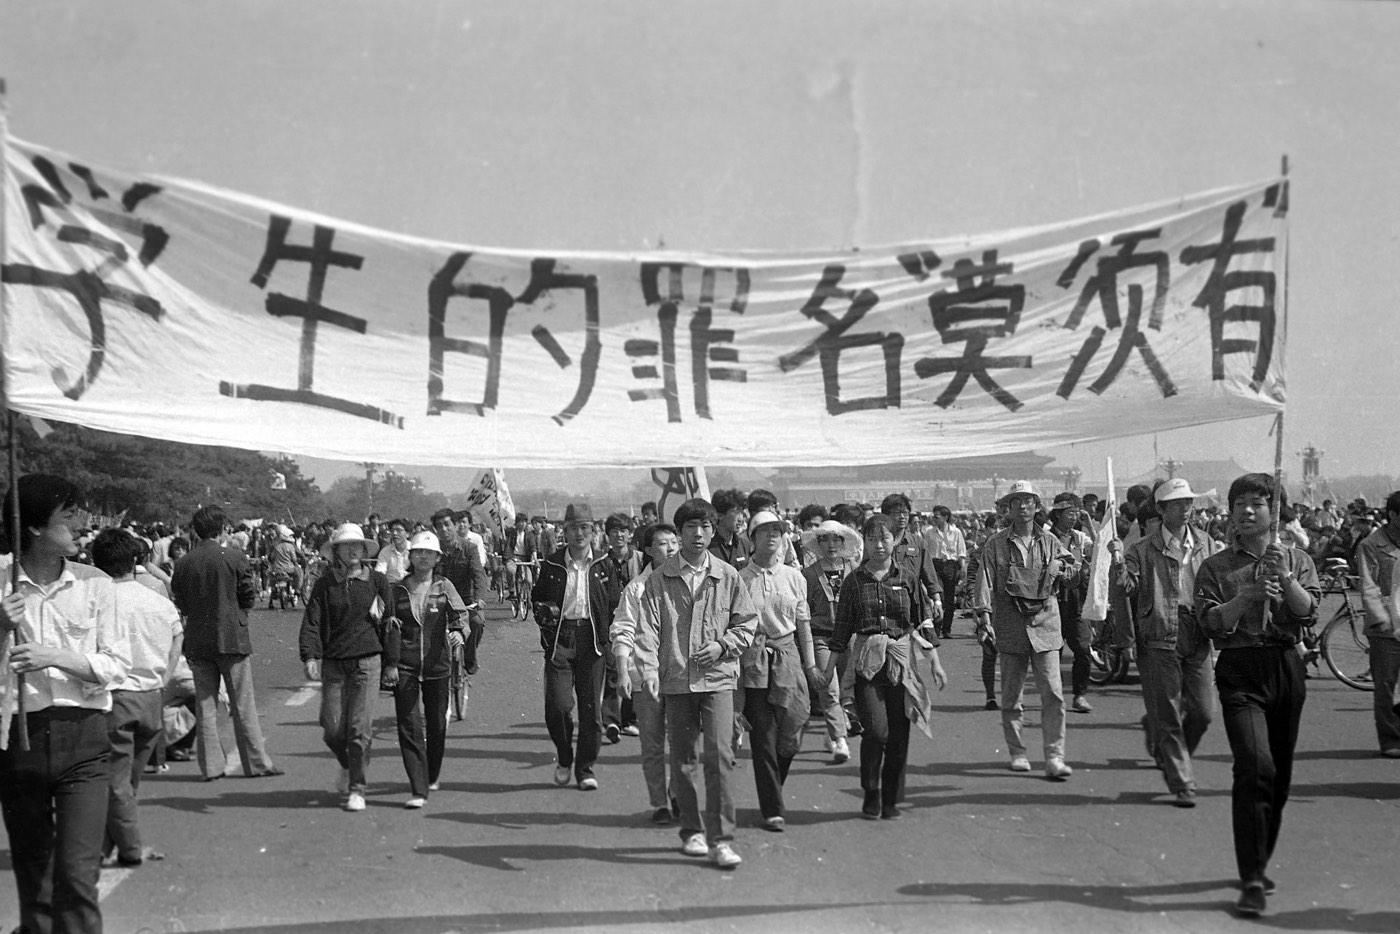 David Chen Tiananmen